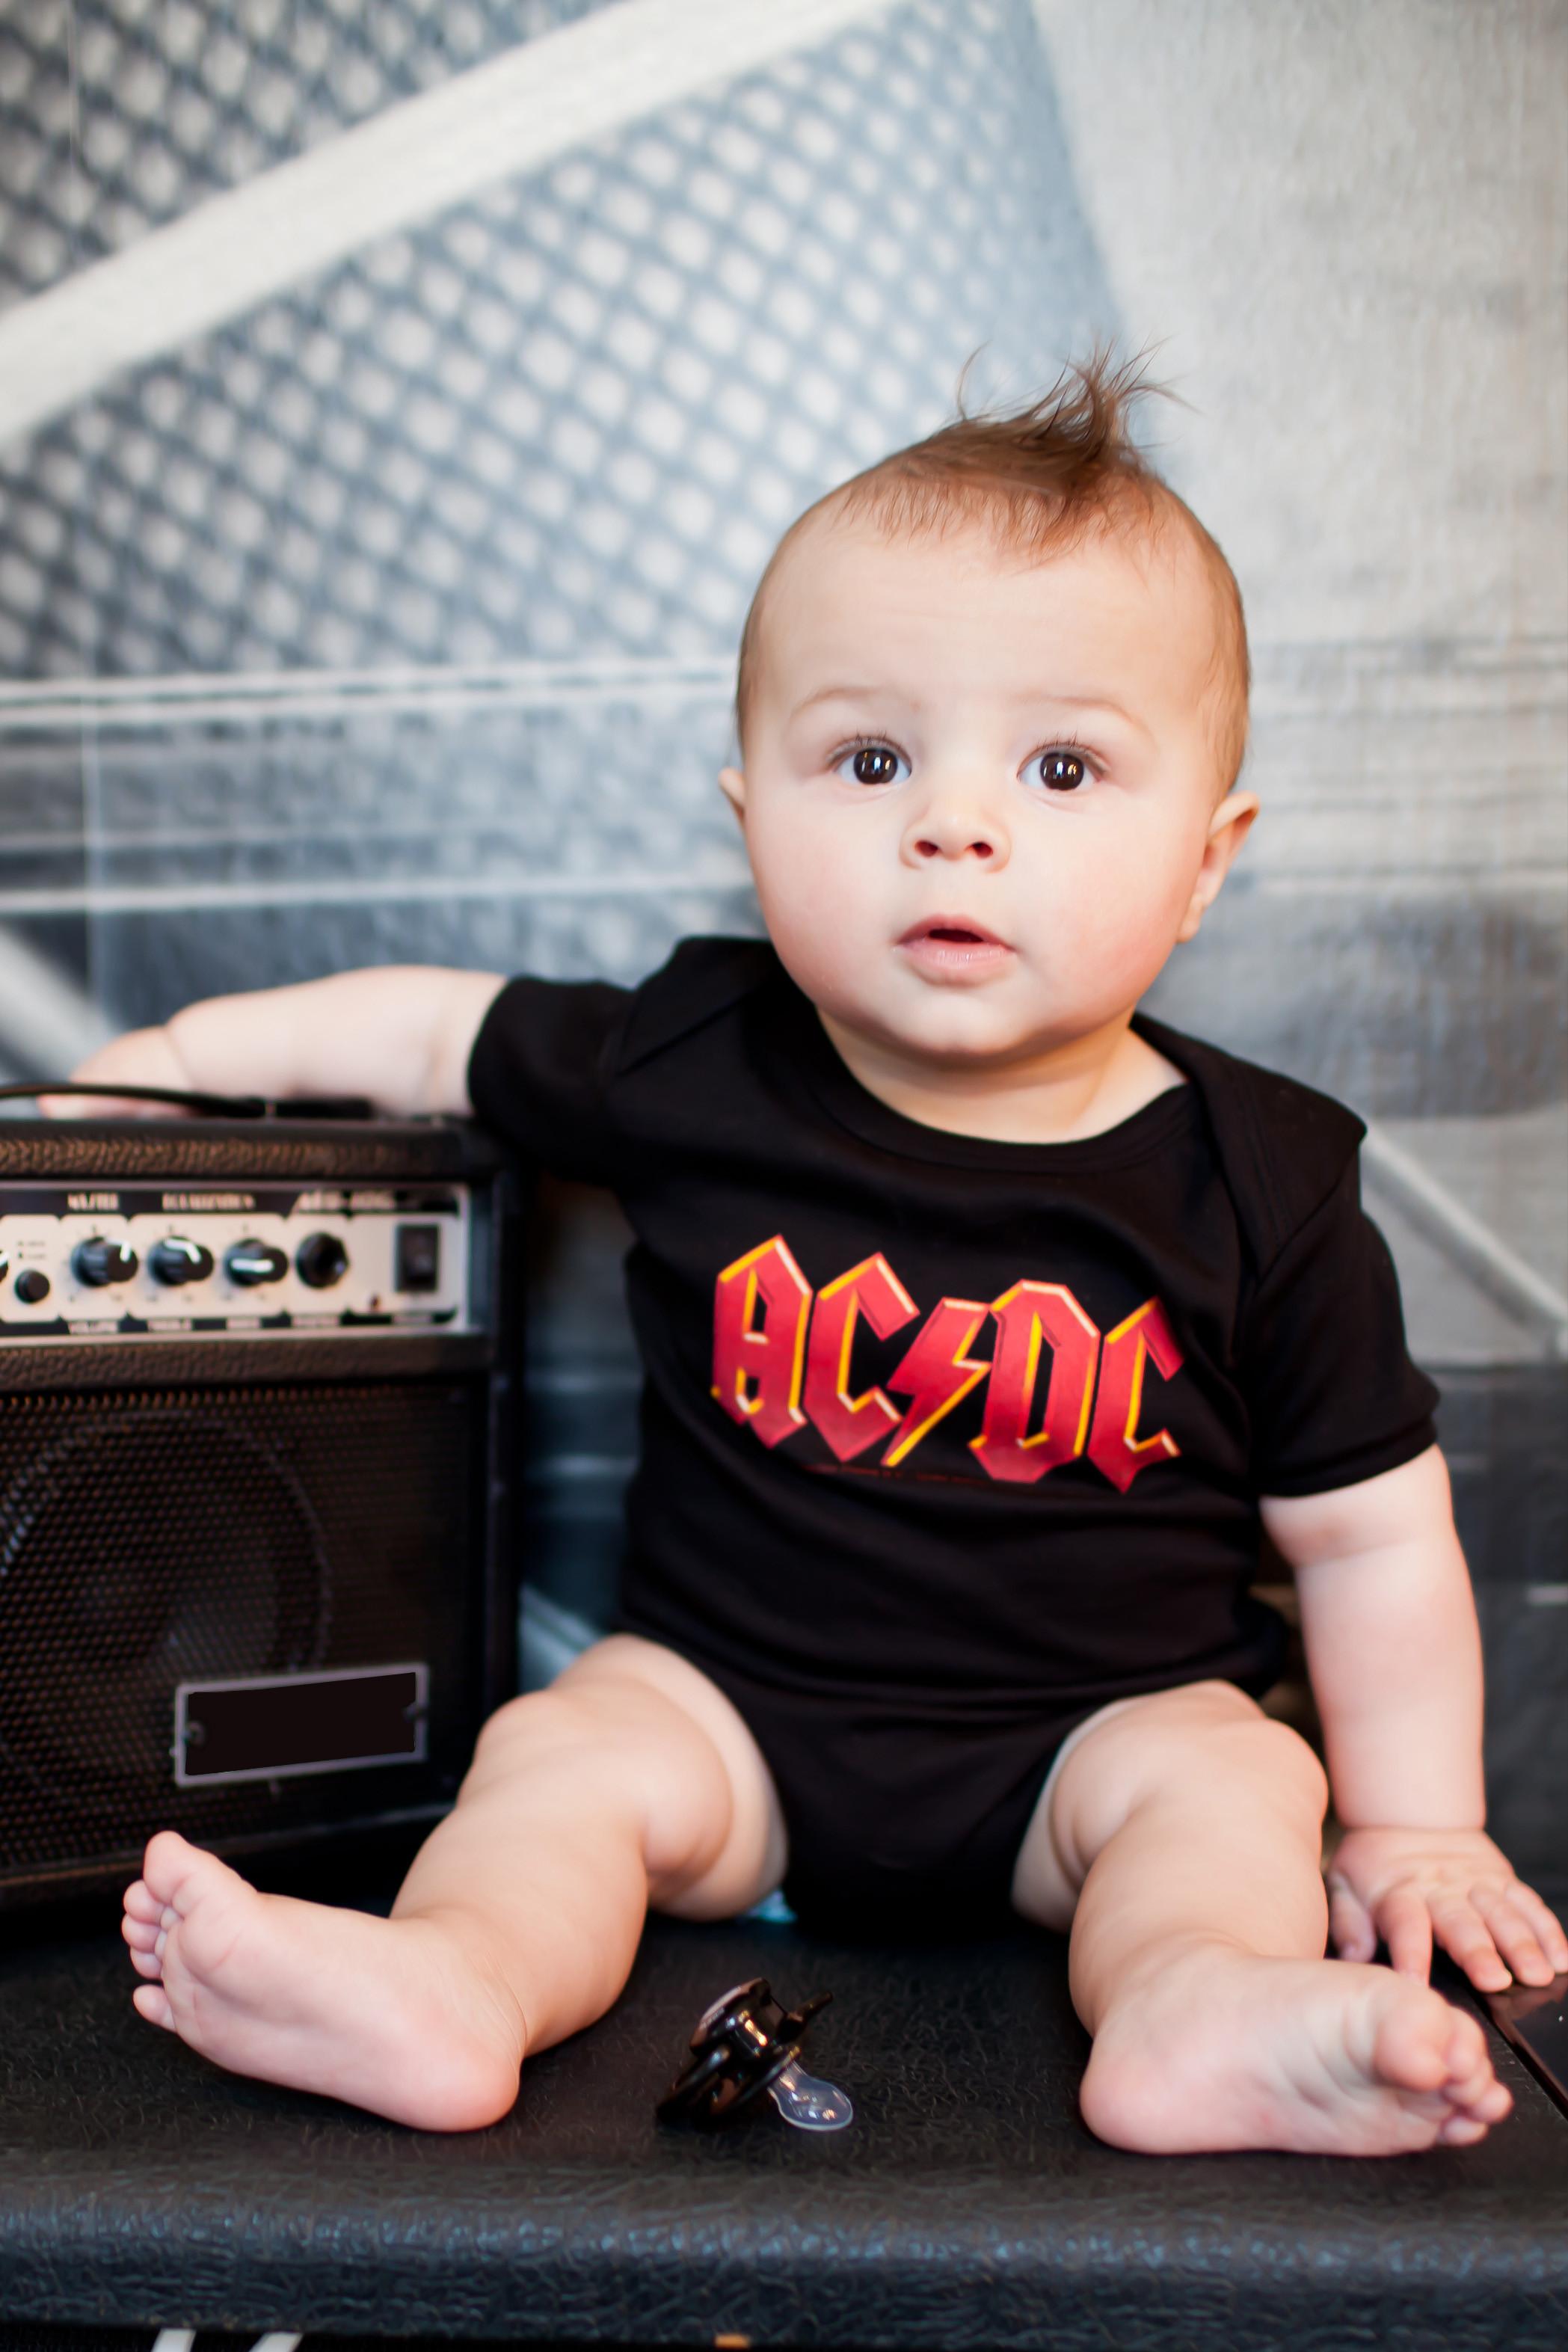 ACDC Baby Body | AC DC Babykleidung